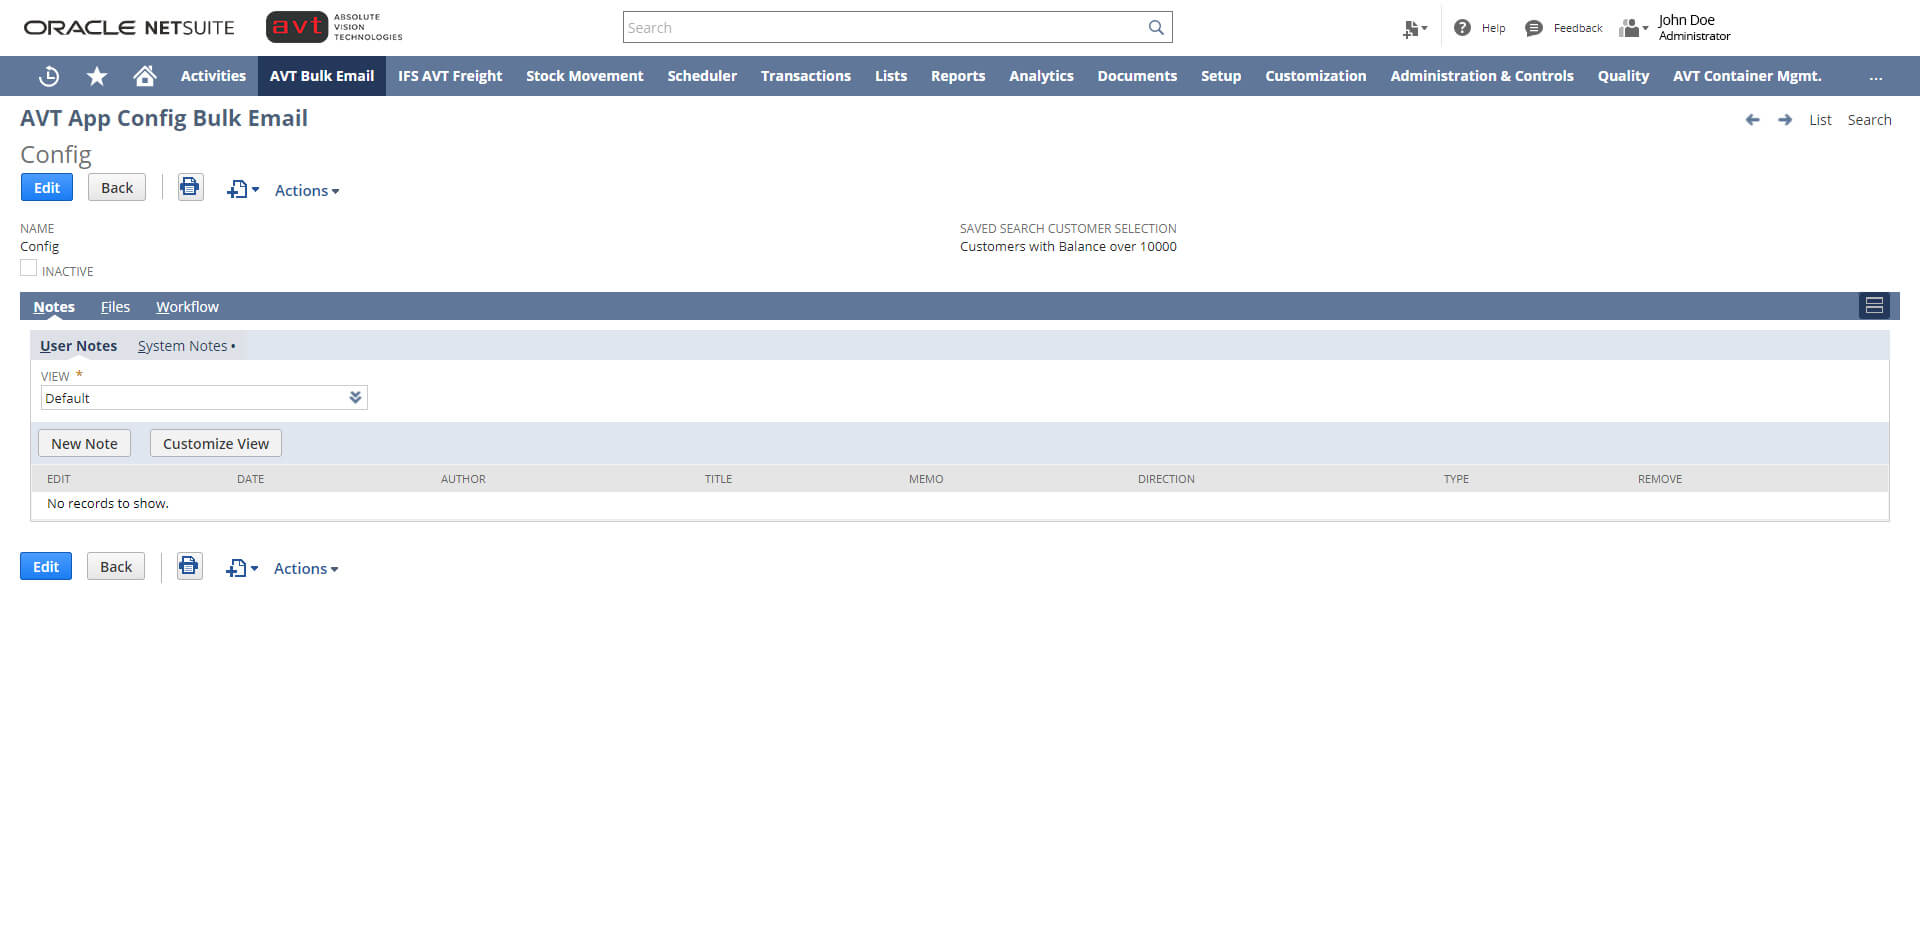 AVT Bulk Invoicing App Email - Configuration